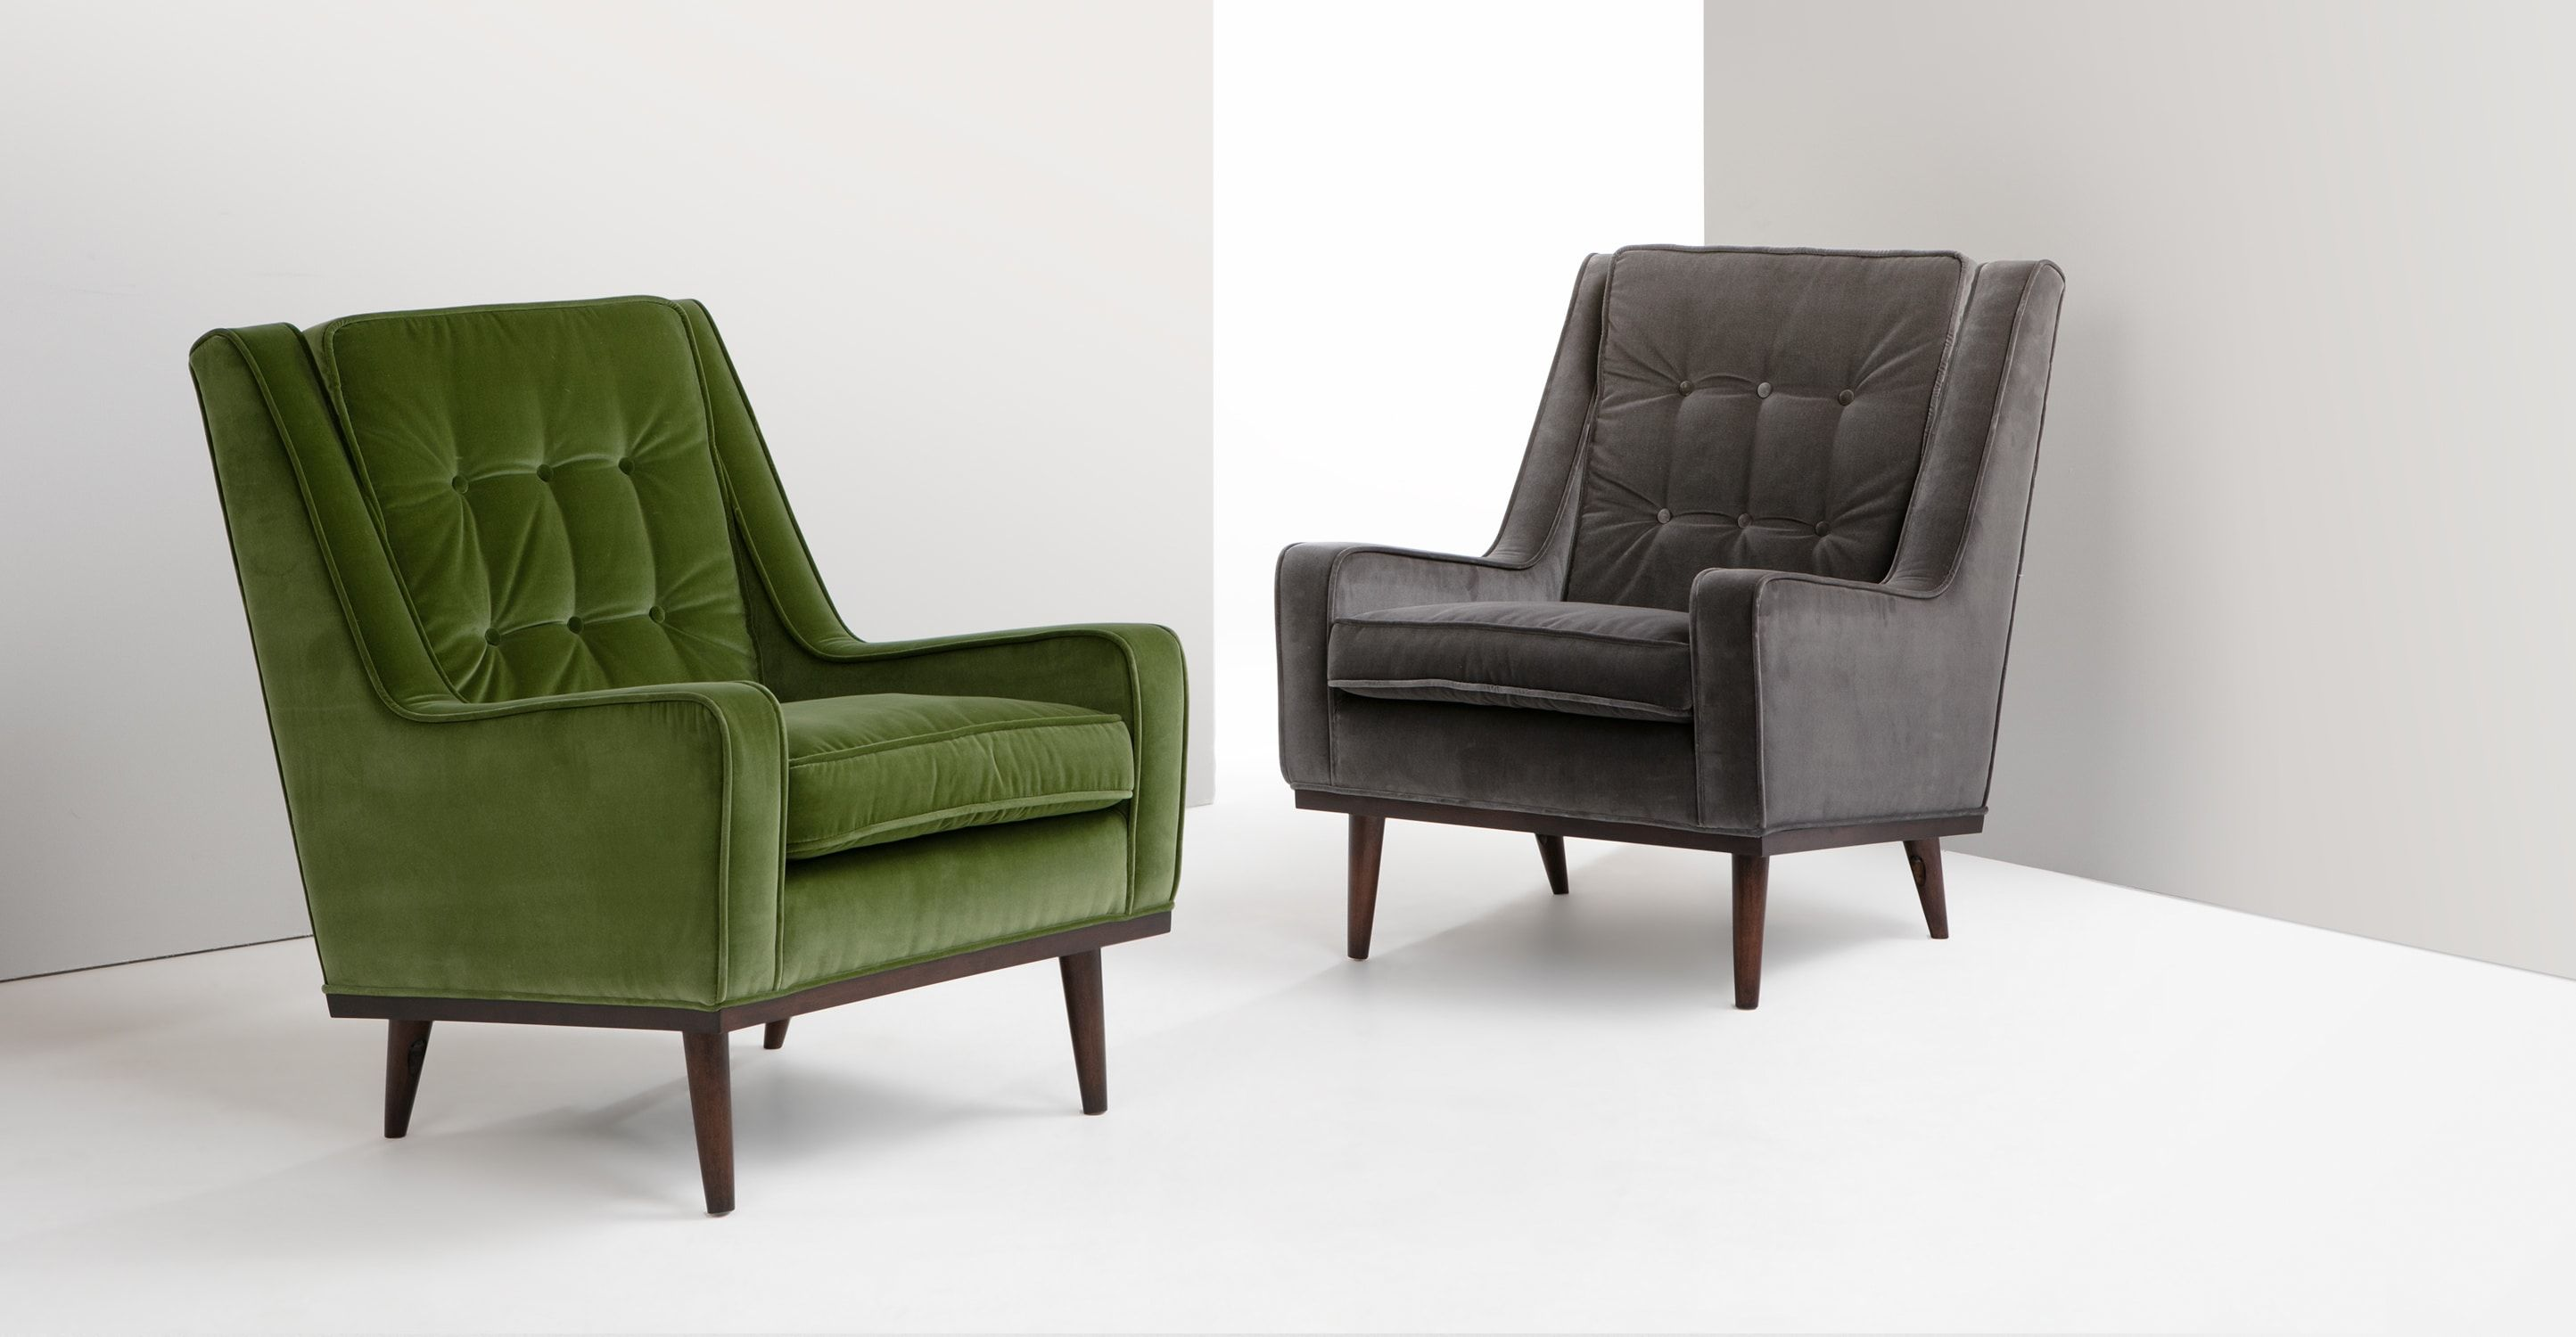 Relaxsessel Wohnzimmer ~ Scott sessel samt in grasgrün